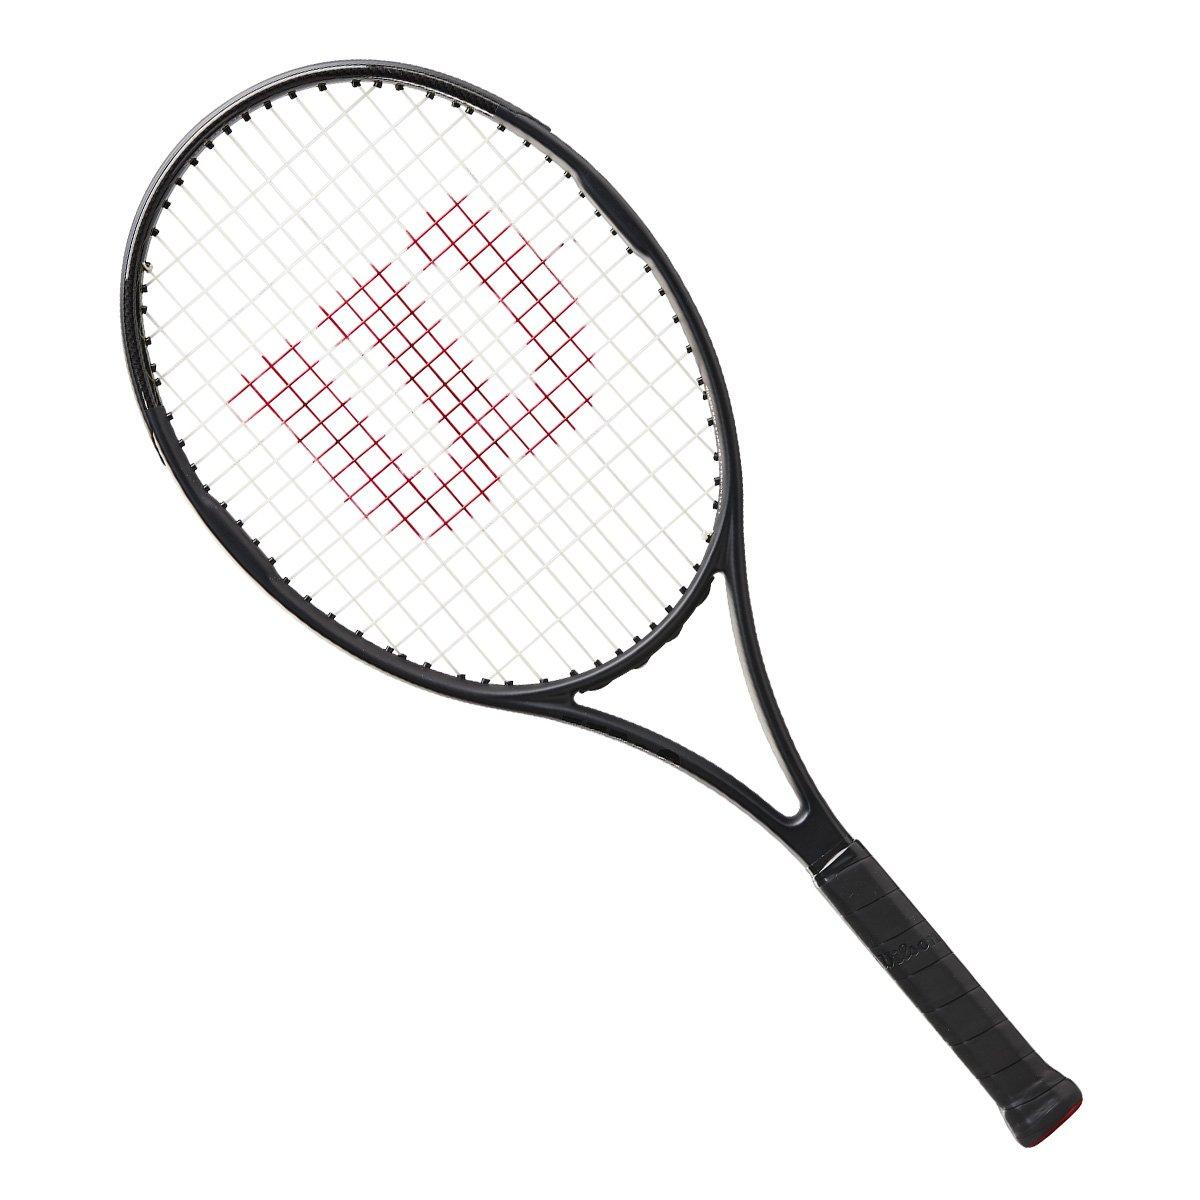 Raquete de Tênis Wilson Pro Staff 26 V13.0 L0 2021